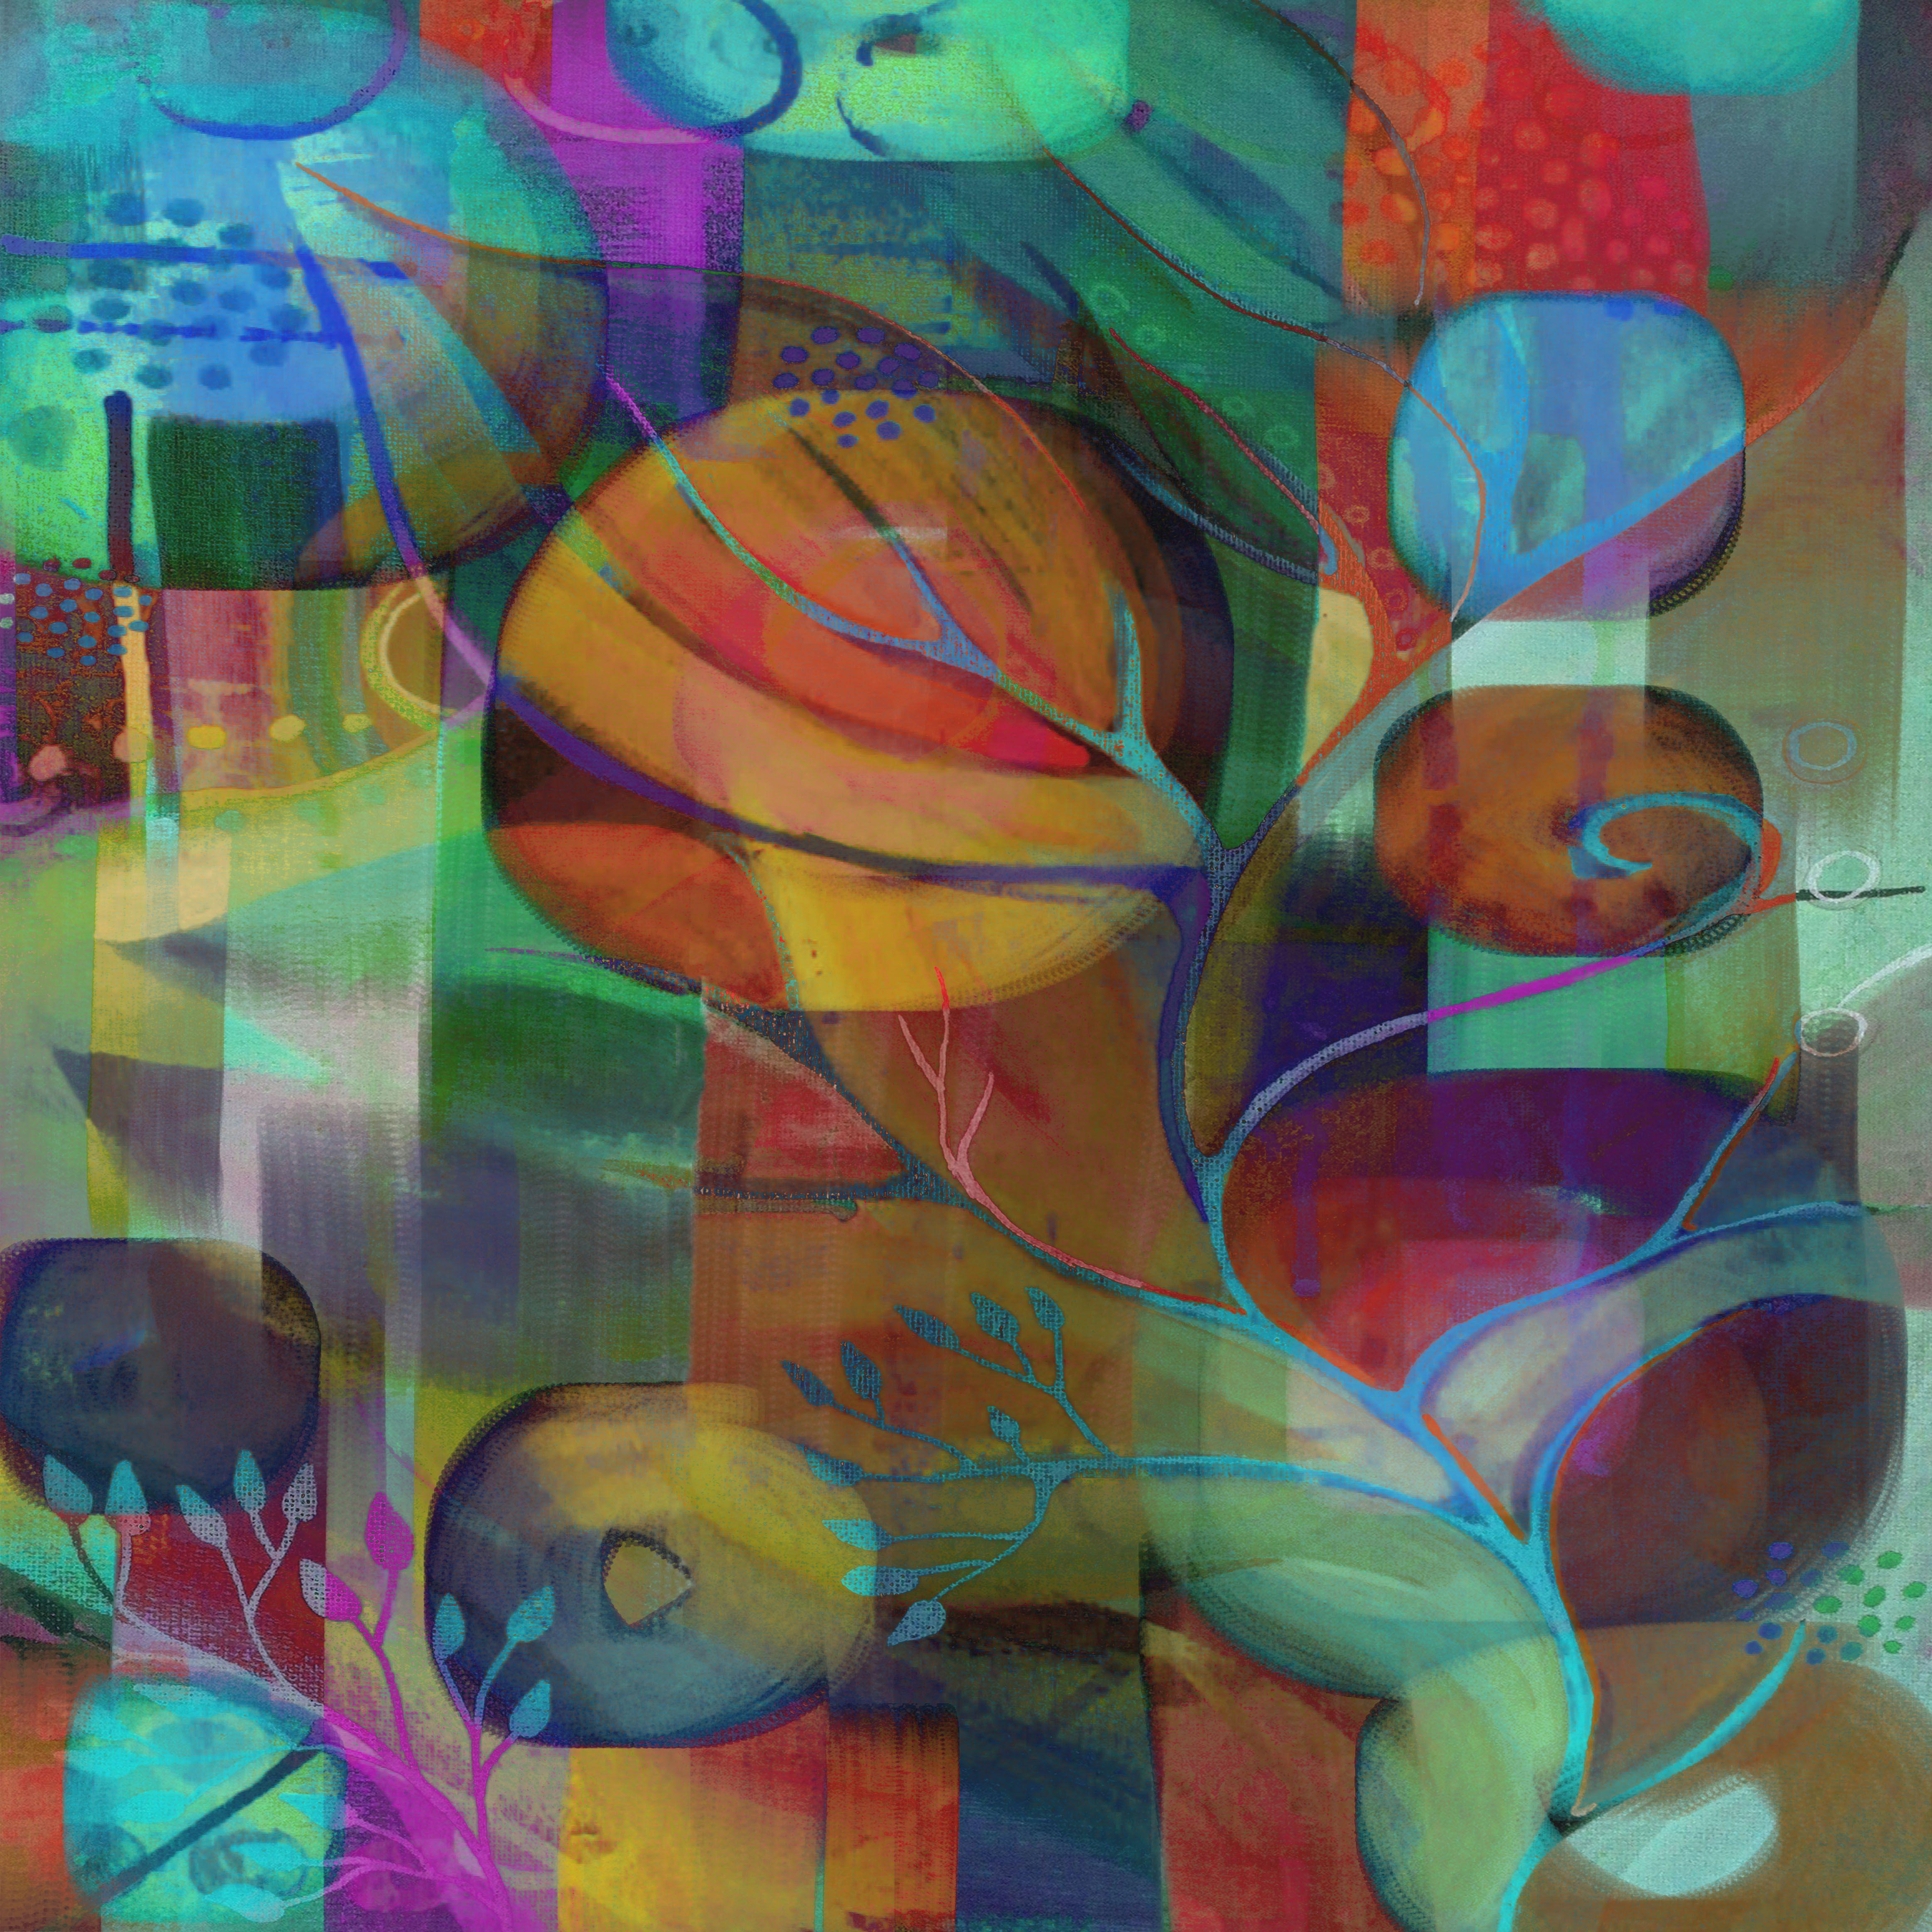 pretty petals acrylic painting by Delores Orridge Naskrent